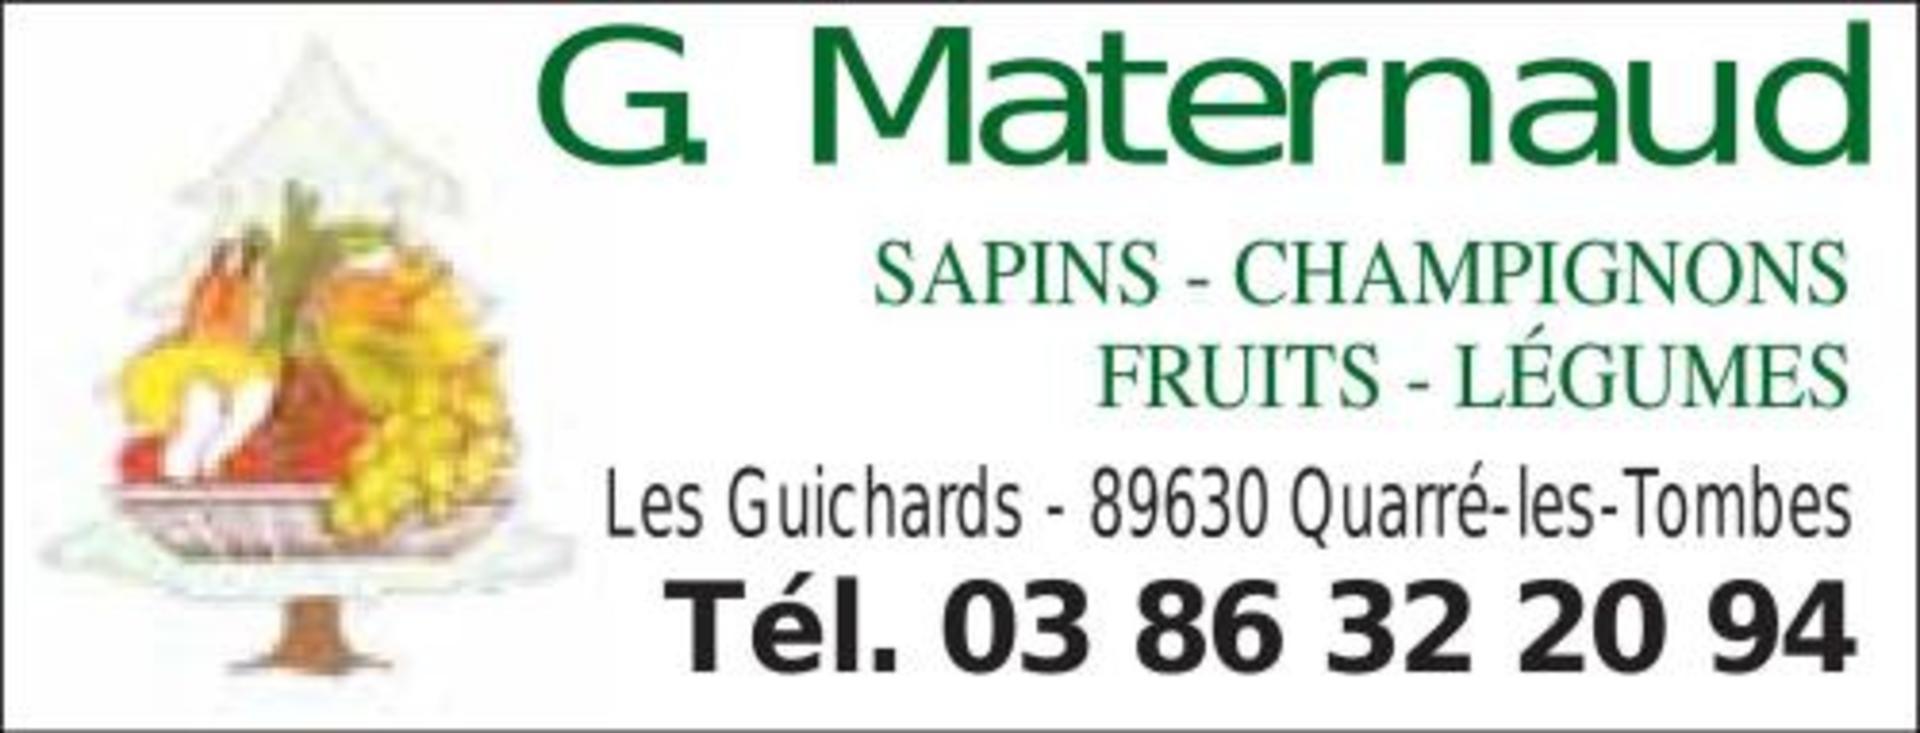 Maternaud